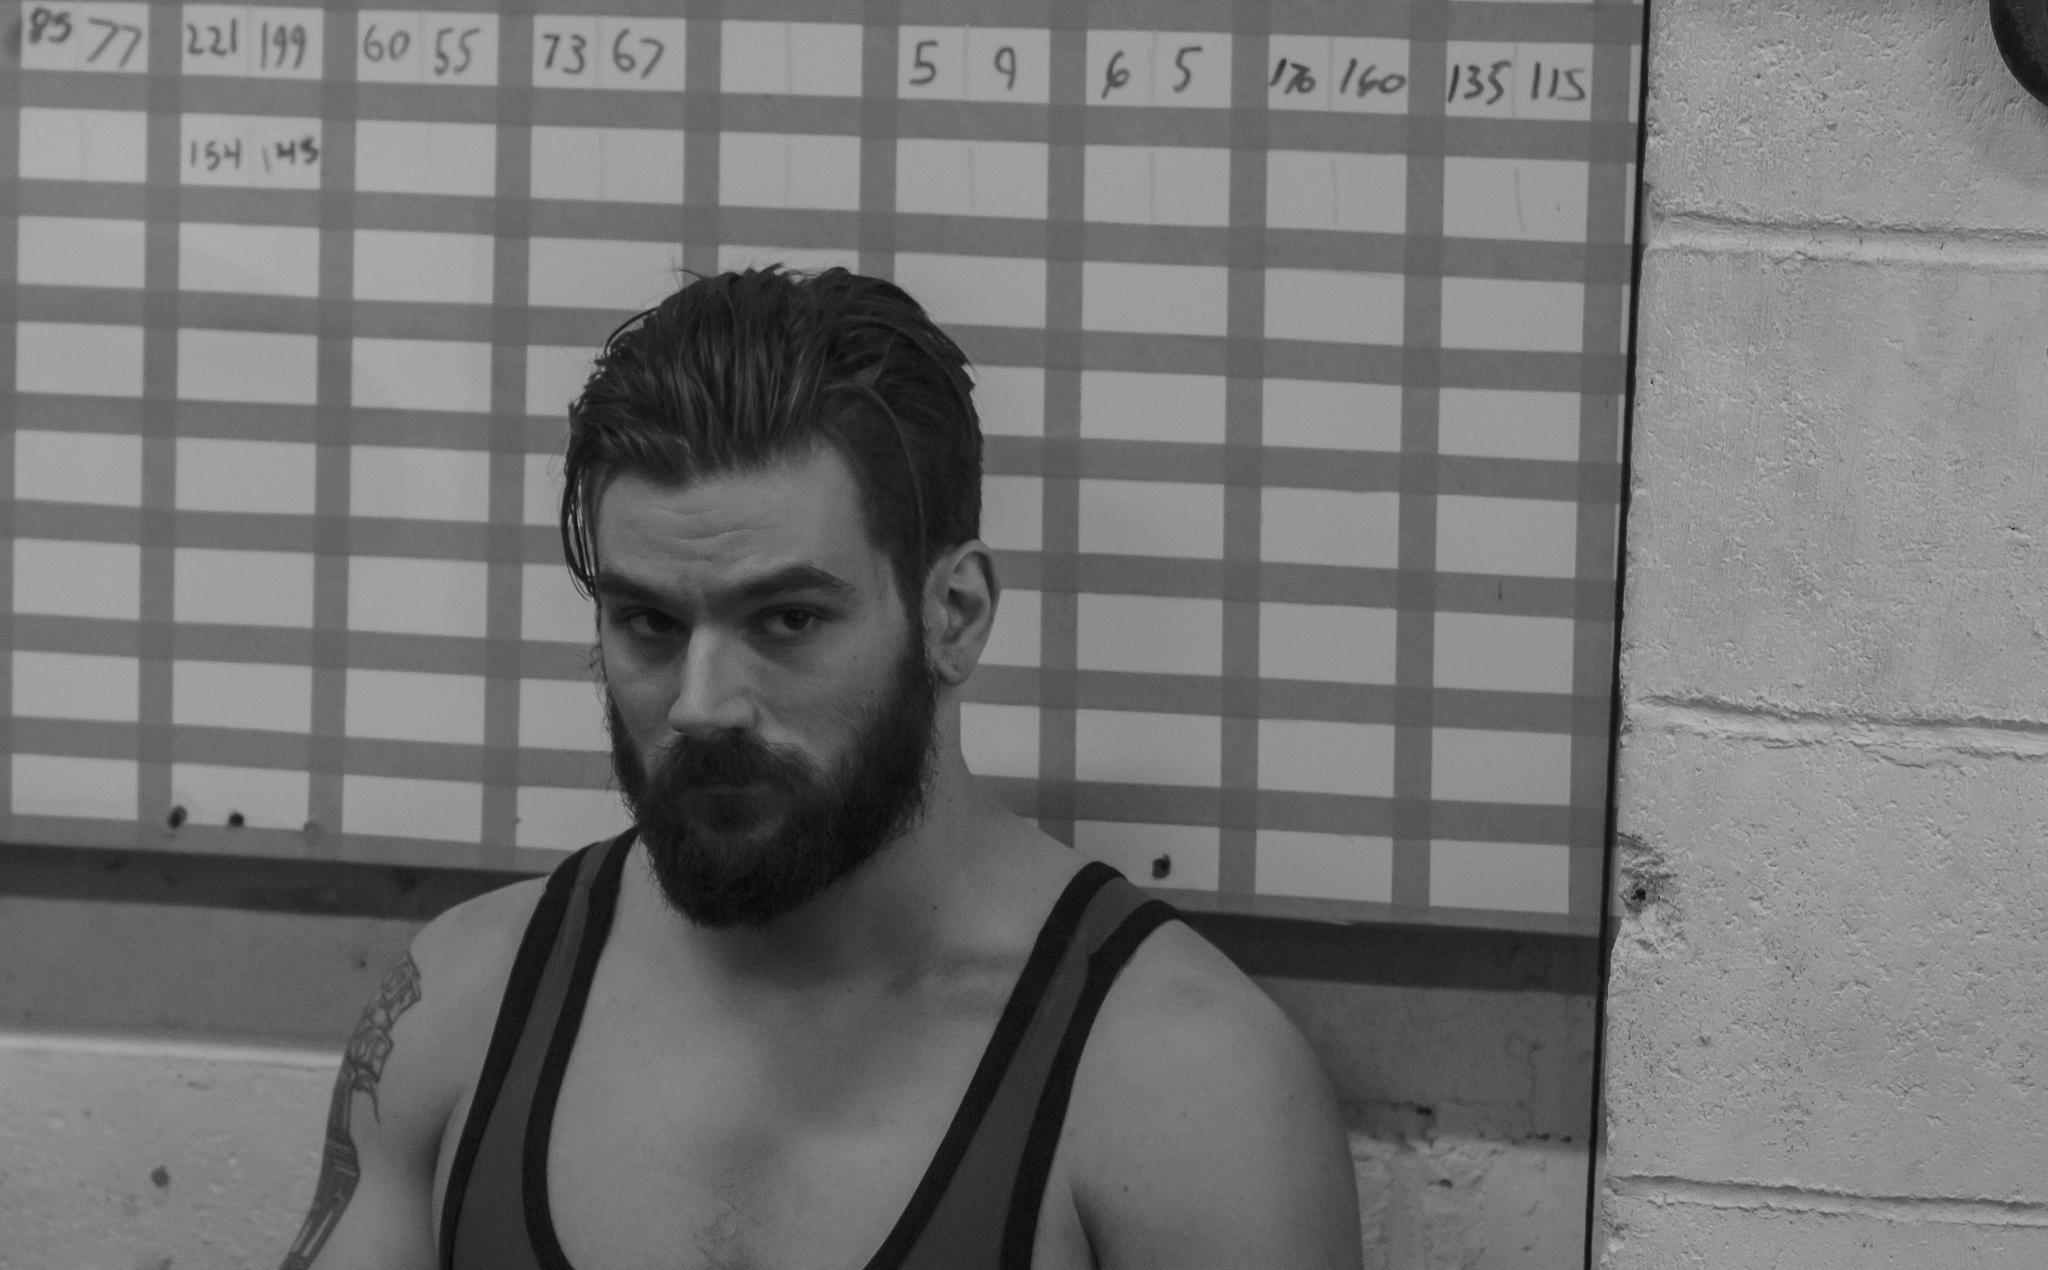 men-warwick-new-york-intrepid-strength-conditioning-winter-open-weightlifting-meet-weightlifting-photography (17 of 24).jpg